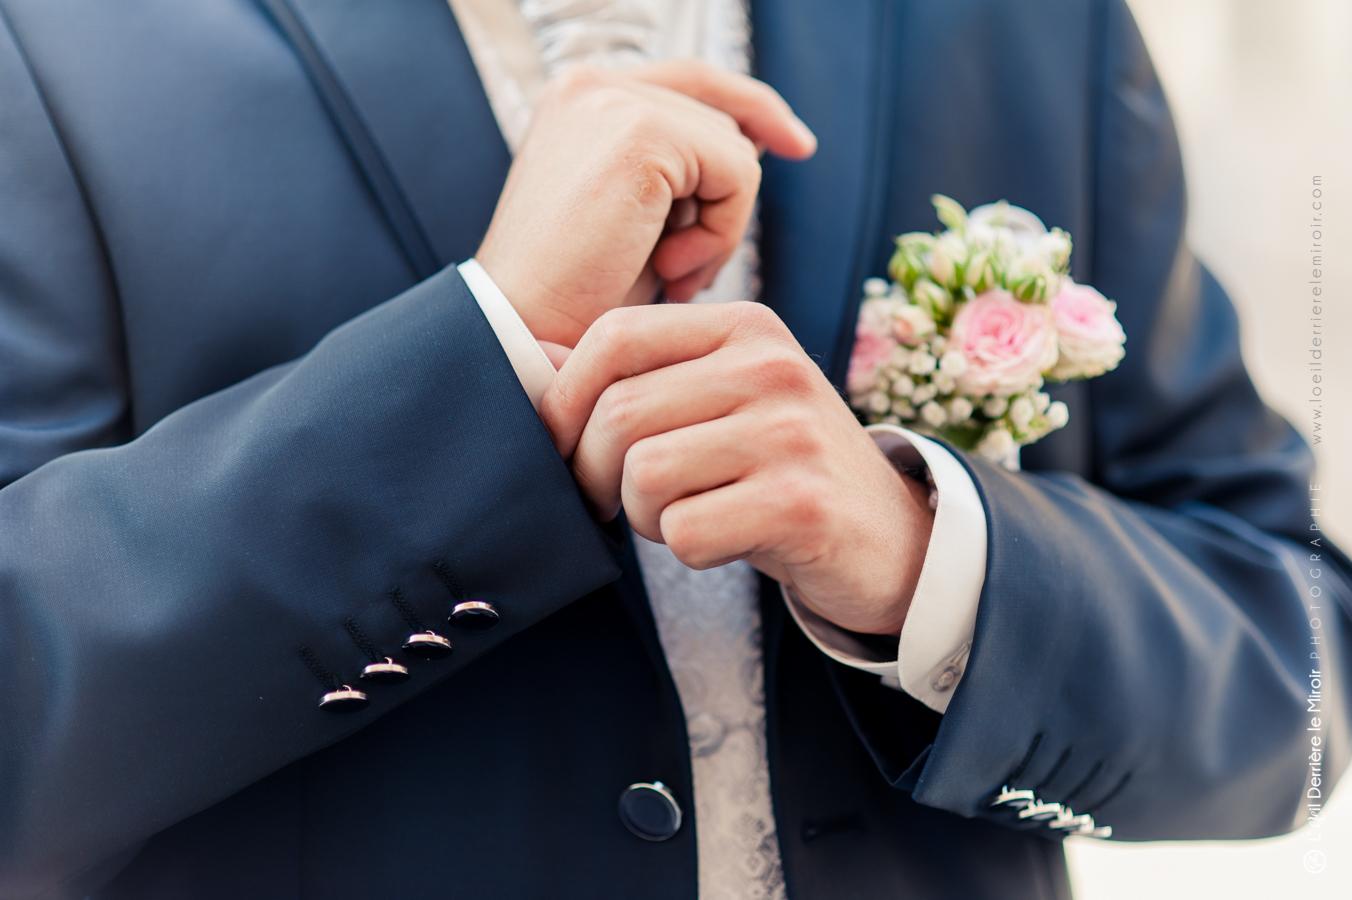 mariage-cj-vaugrenier-loeilderrierelemiroir-025